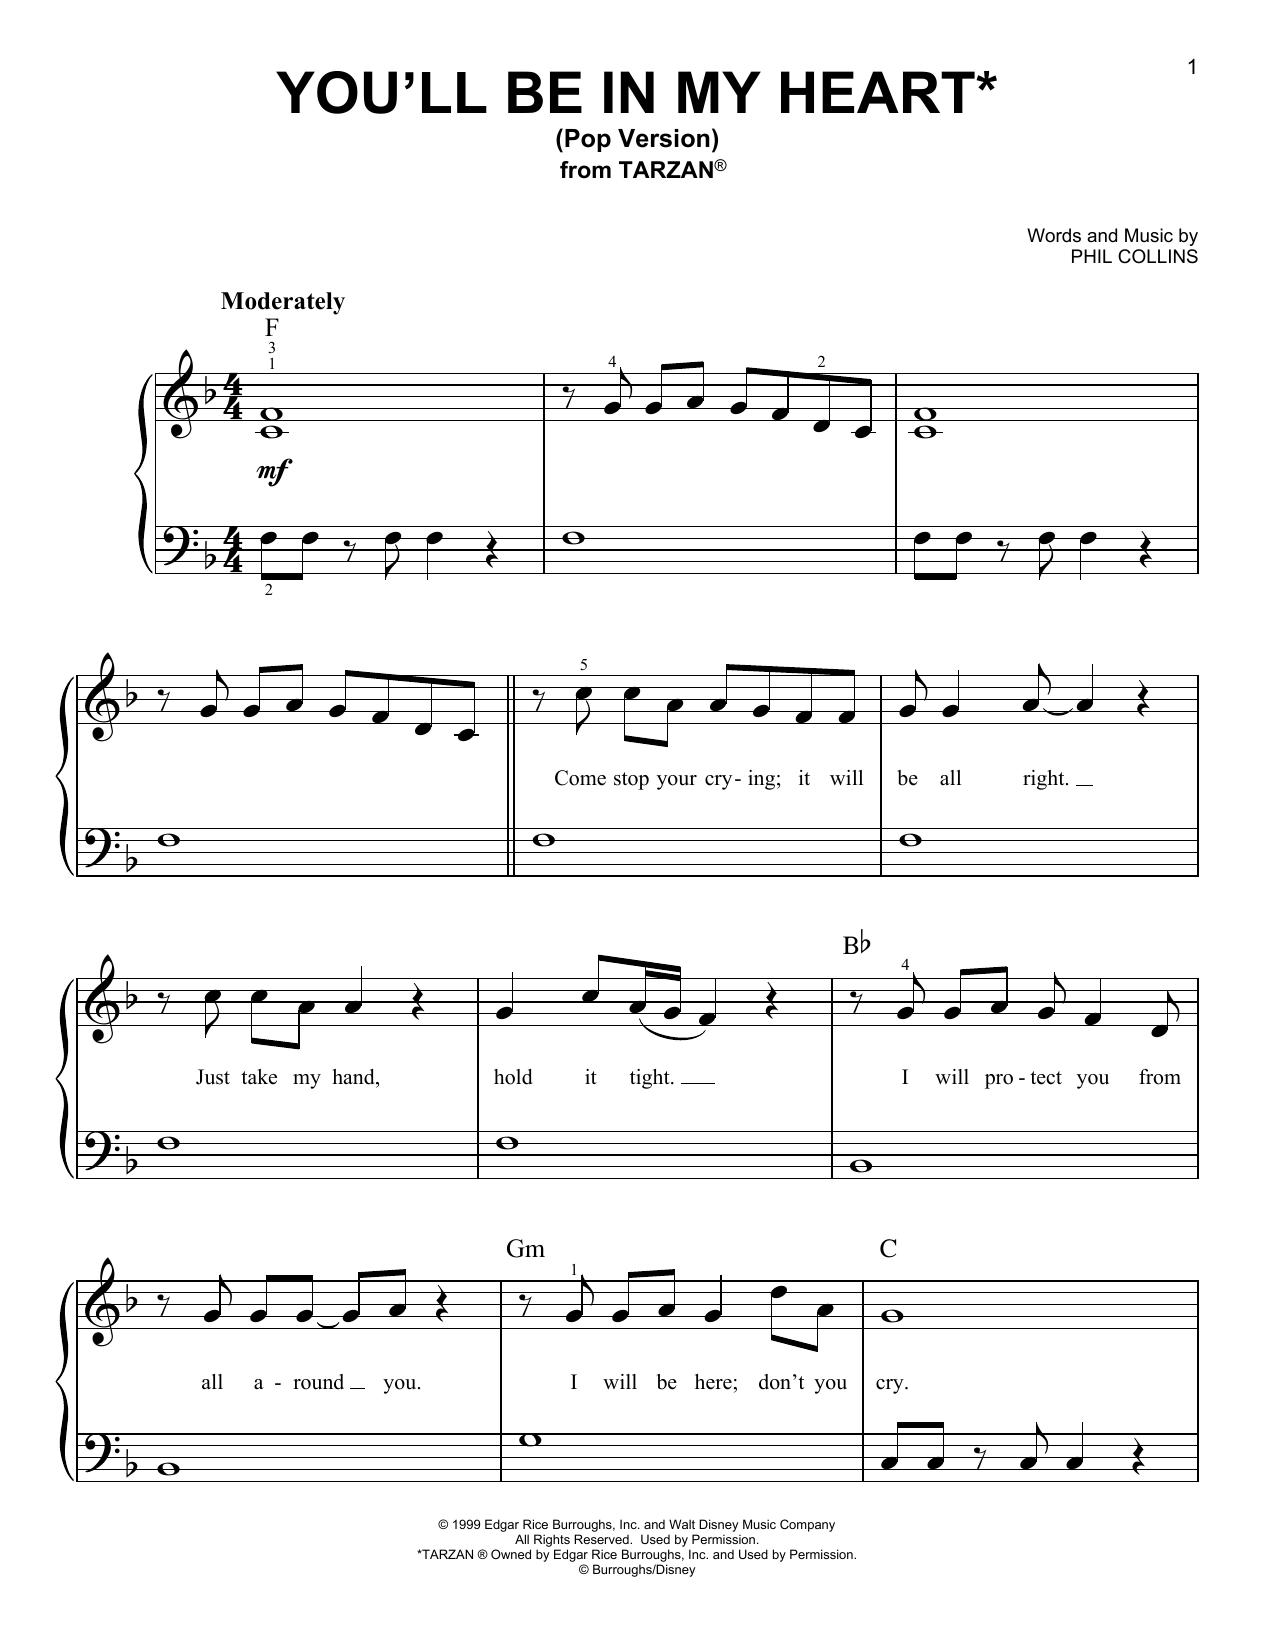 You'll Be In My Heart (Pop Version) (from Tarzan) (Very Easy Piano)